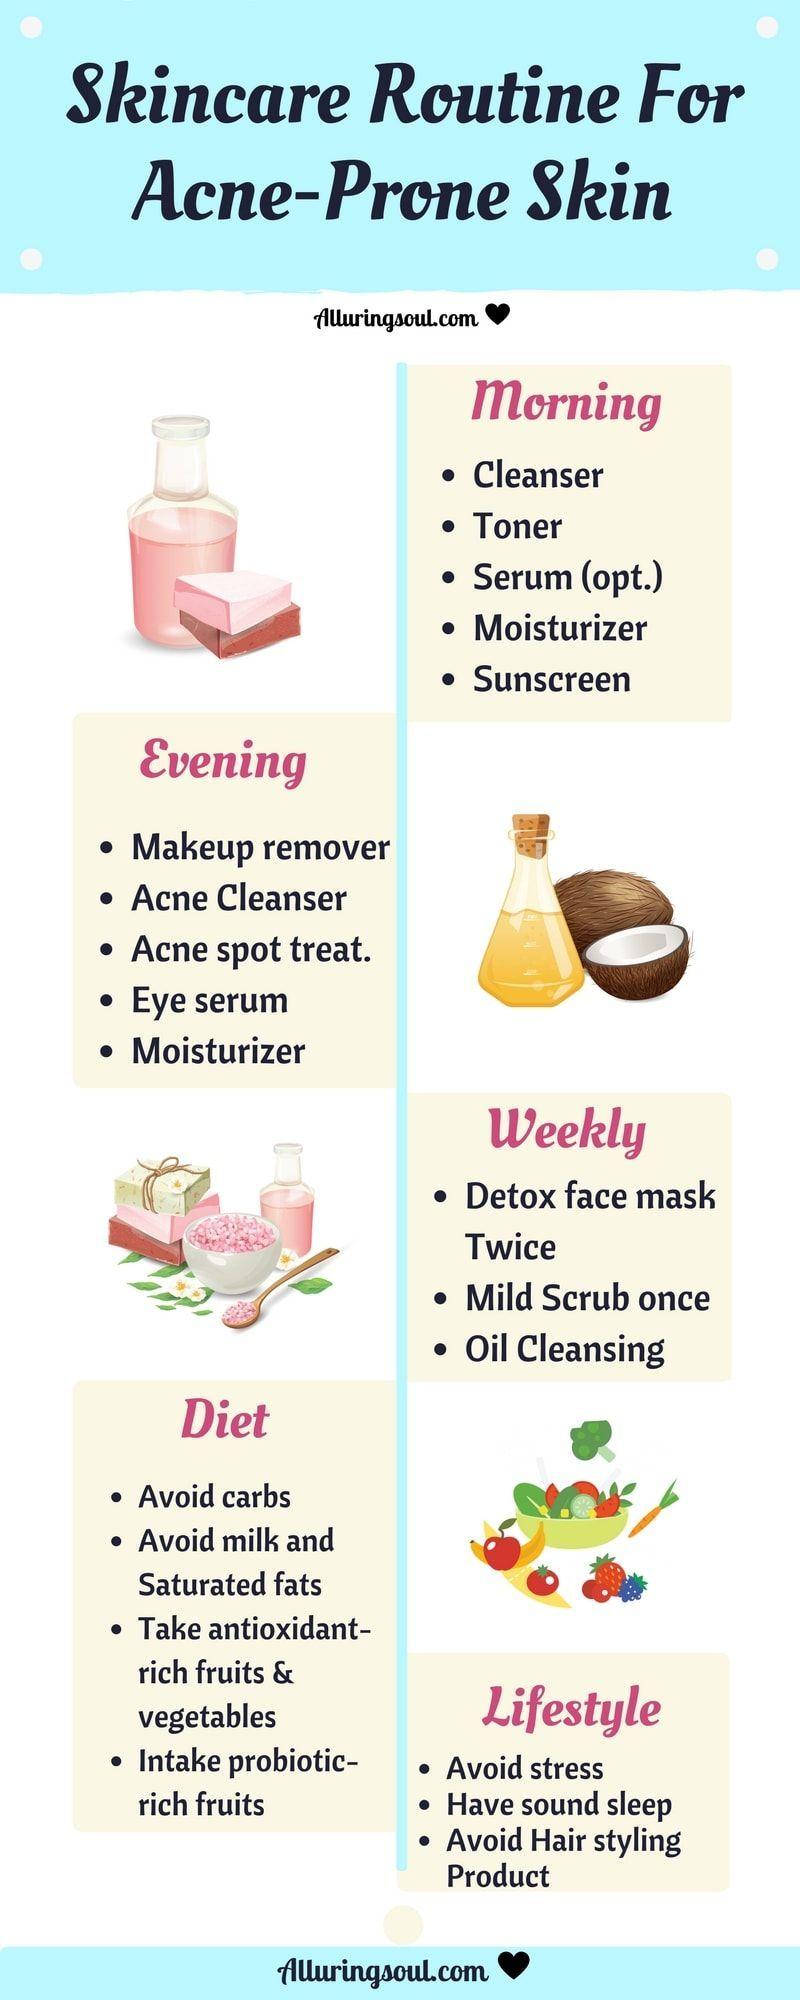 Natural Skin Care Guide For Acne Prone Skin Skin care